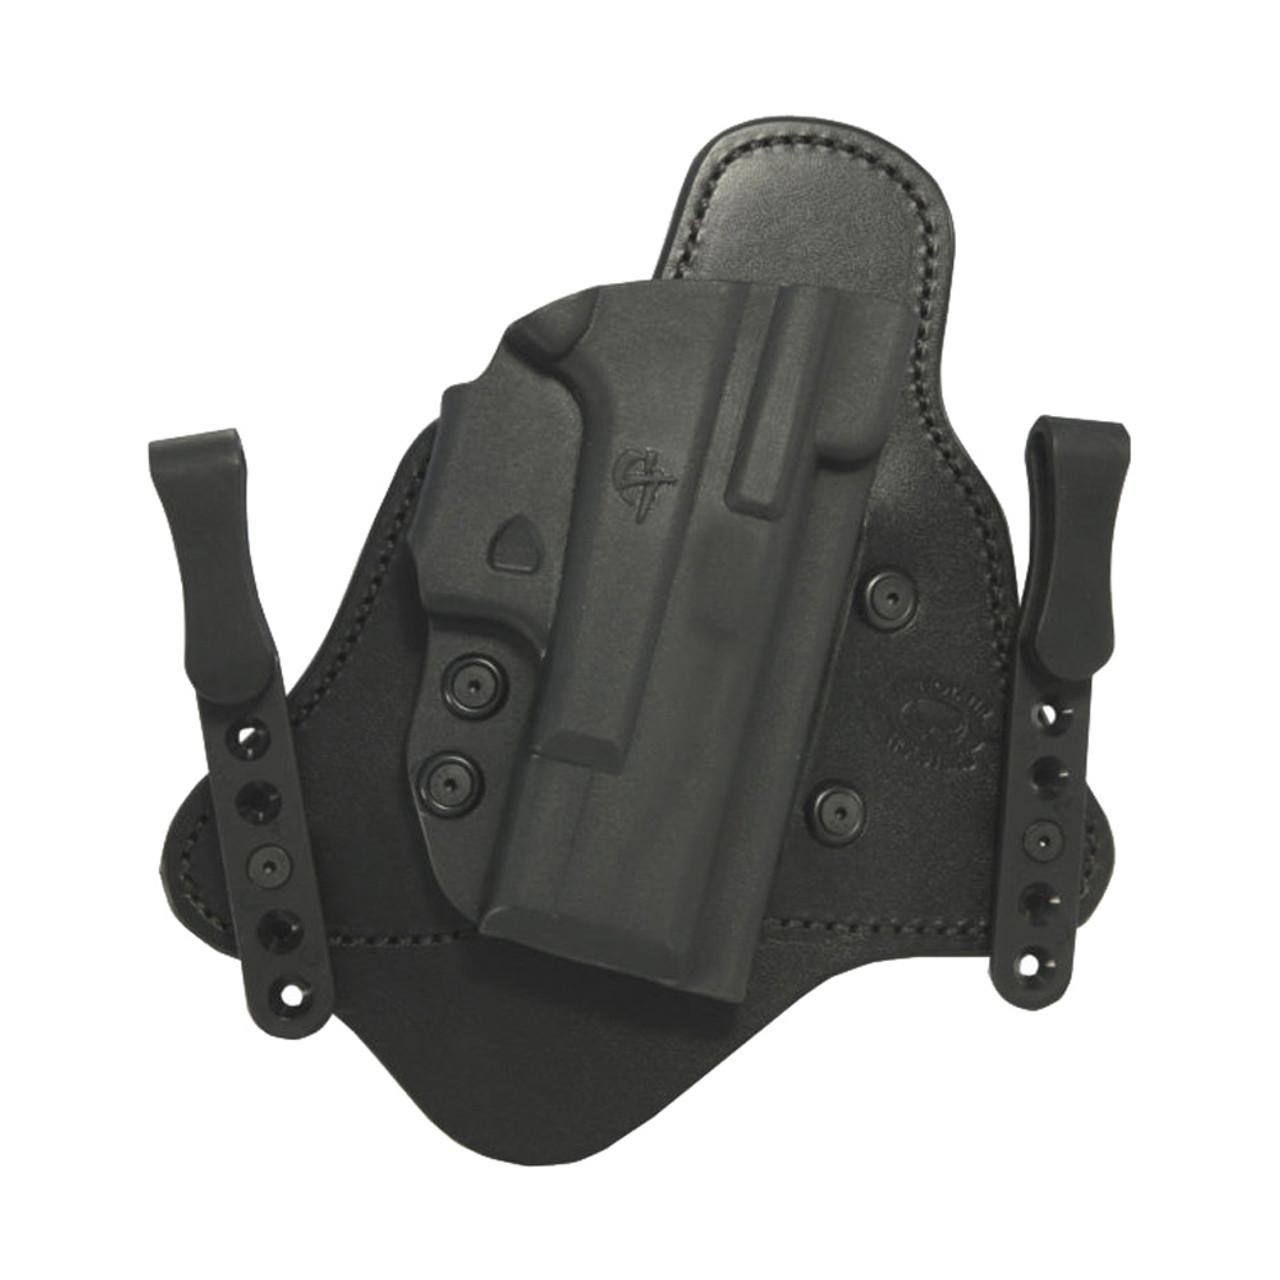 COMP-TAC MTAC IWB Hybrid Walther PPQ M1/M2 4in RSC Black Holster  (C225WA218RBKN)